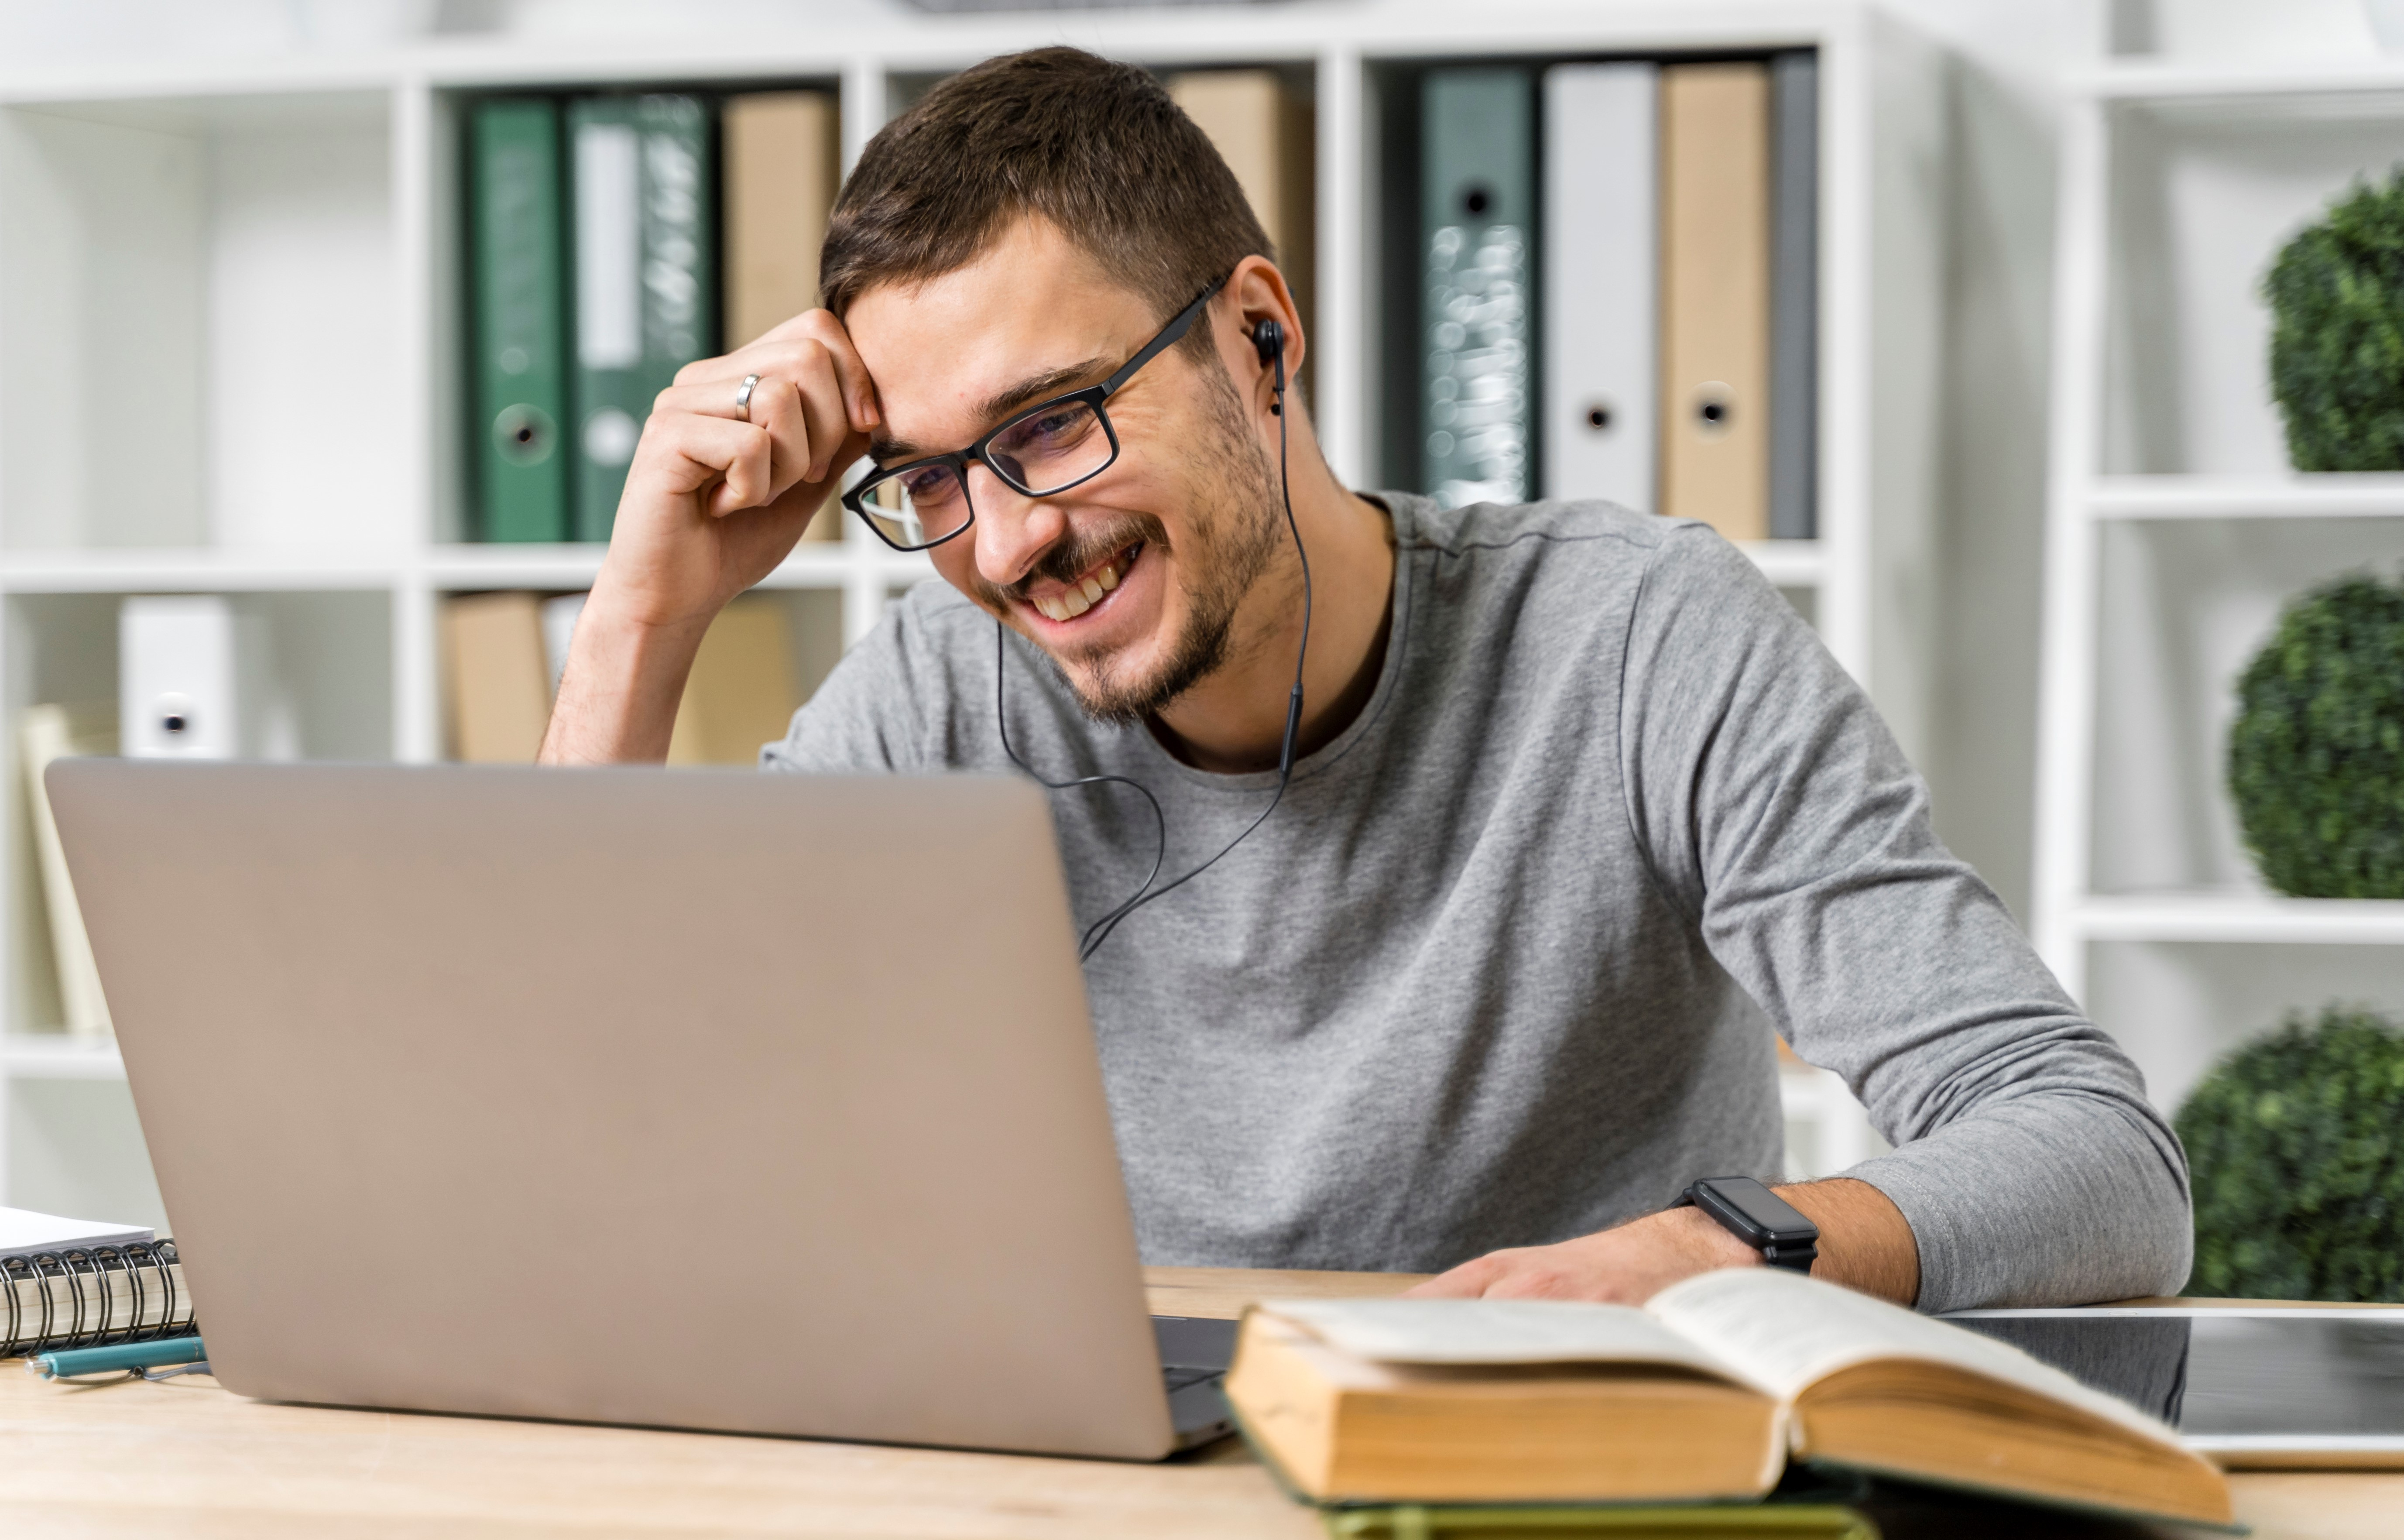 professor dicas para migrar do ensino presencial para a EAD